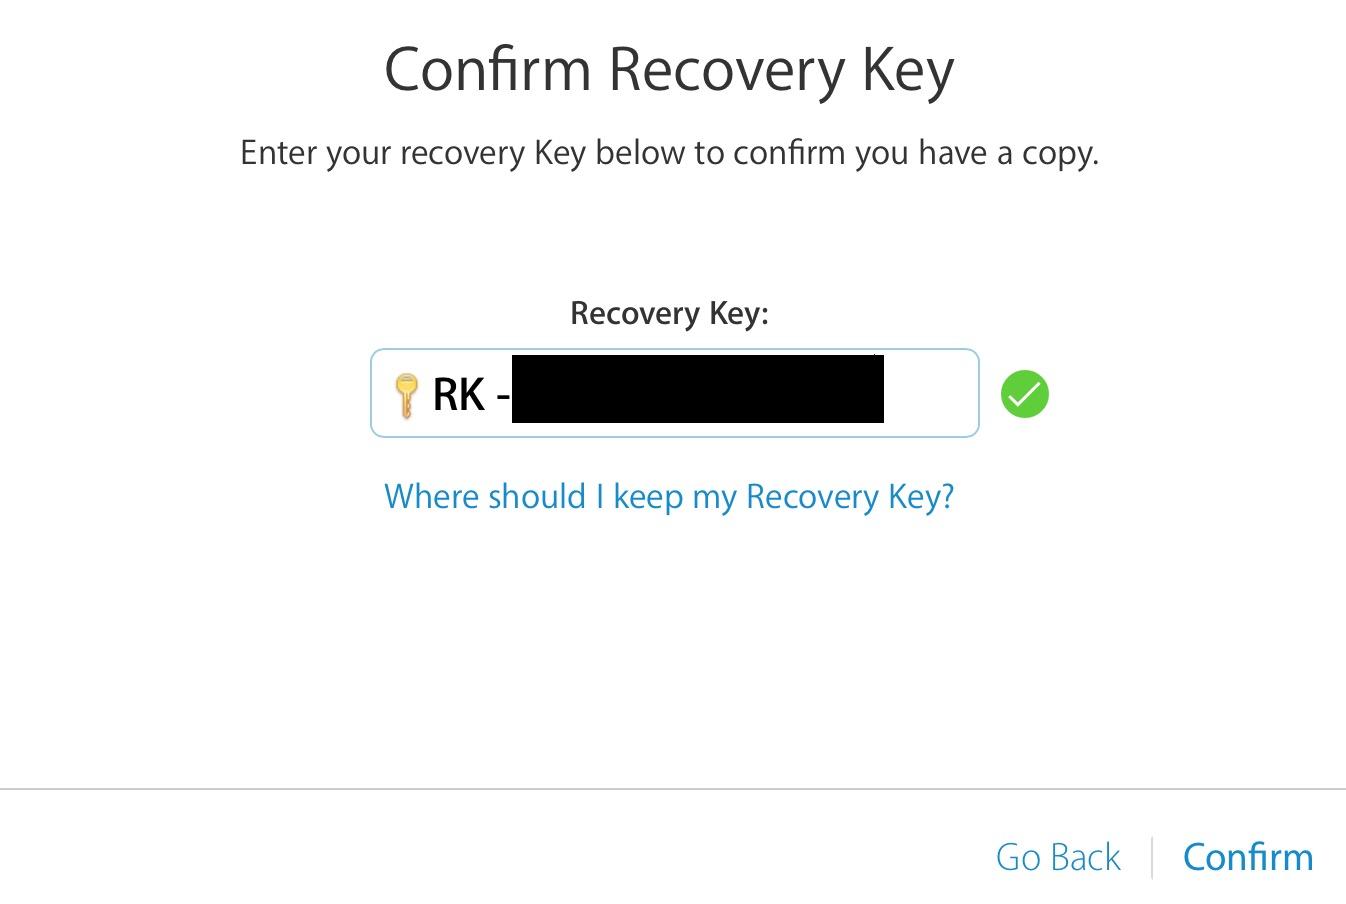 clave de recuperación de confirmación de verificación en dos pasos